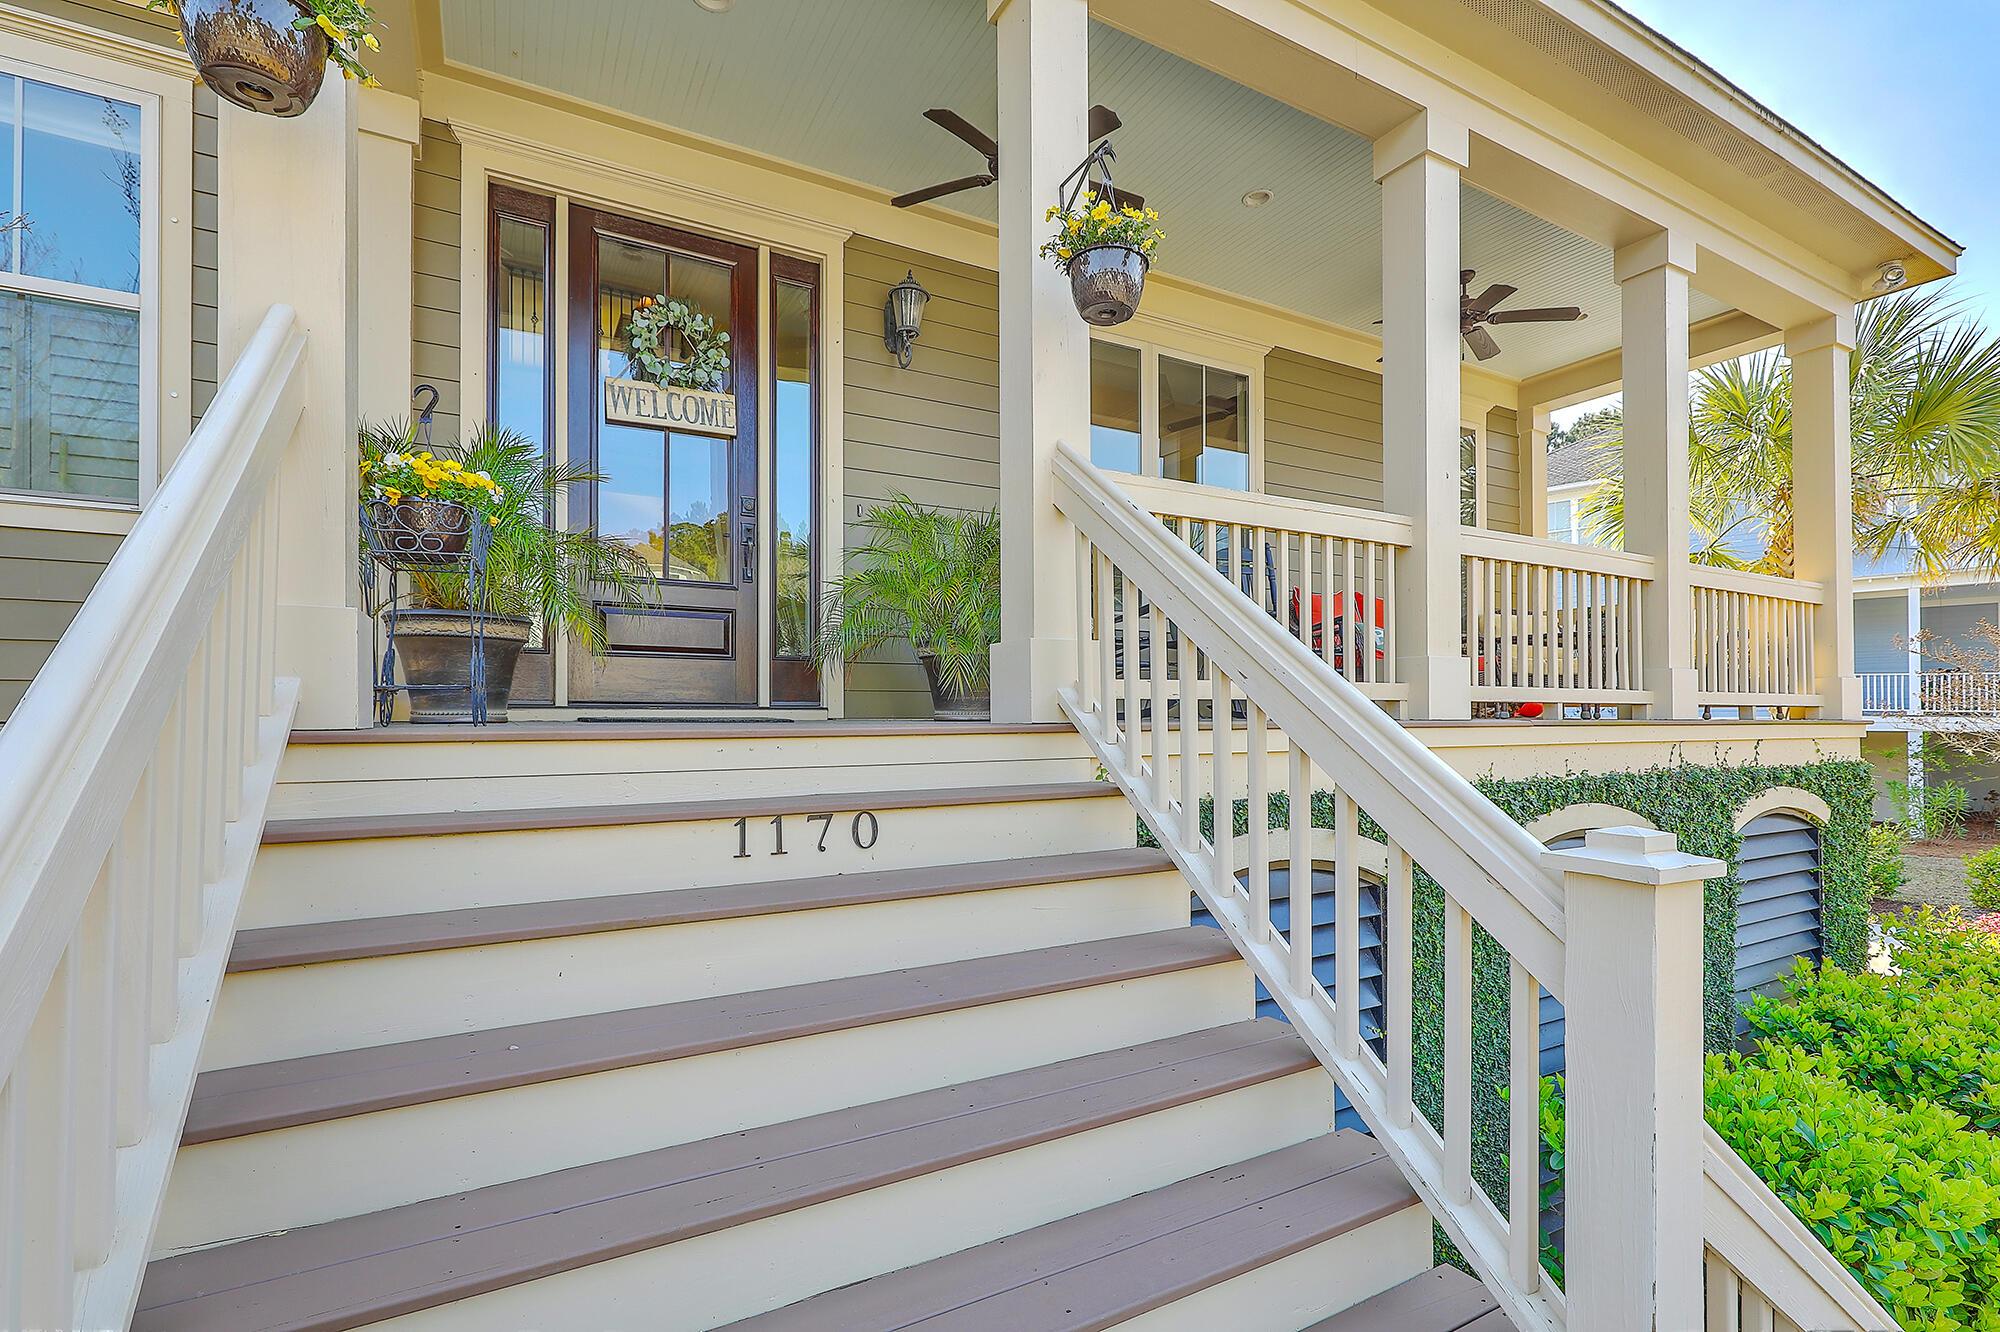 Beresford Creek Landing Homes For Sale - 1170 Rivershore, Charleston, SC - 2